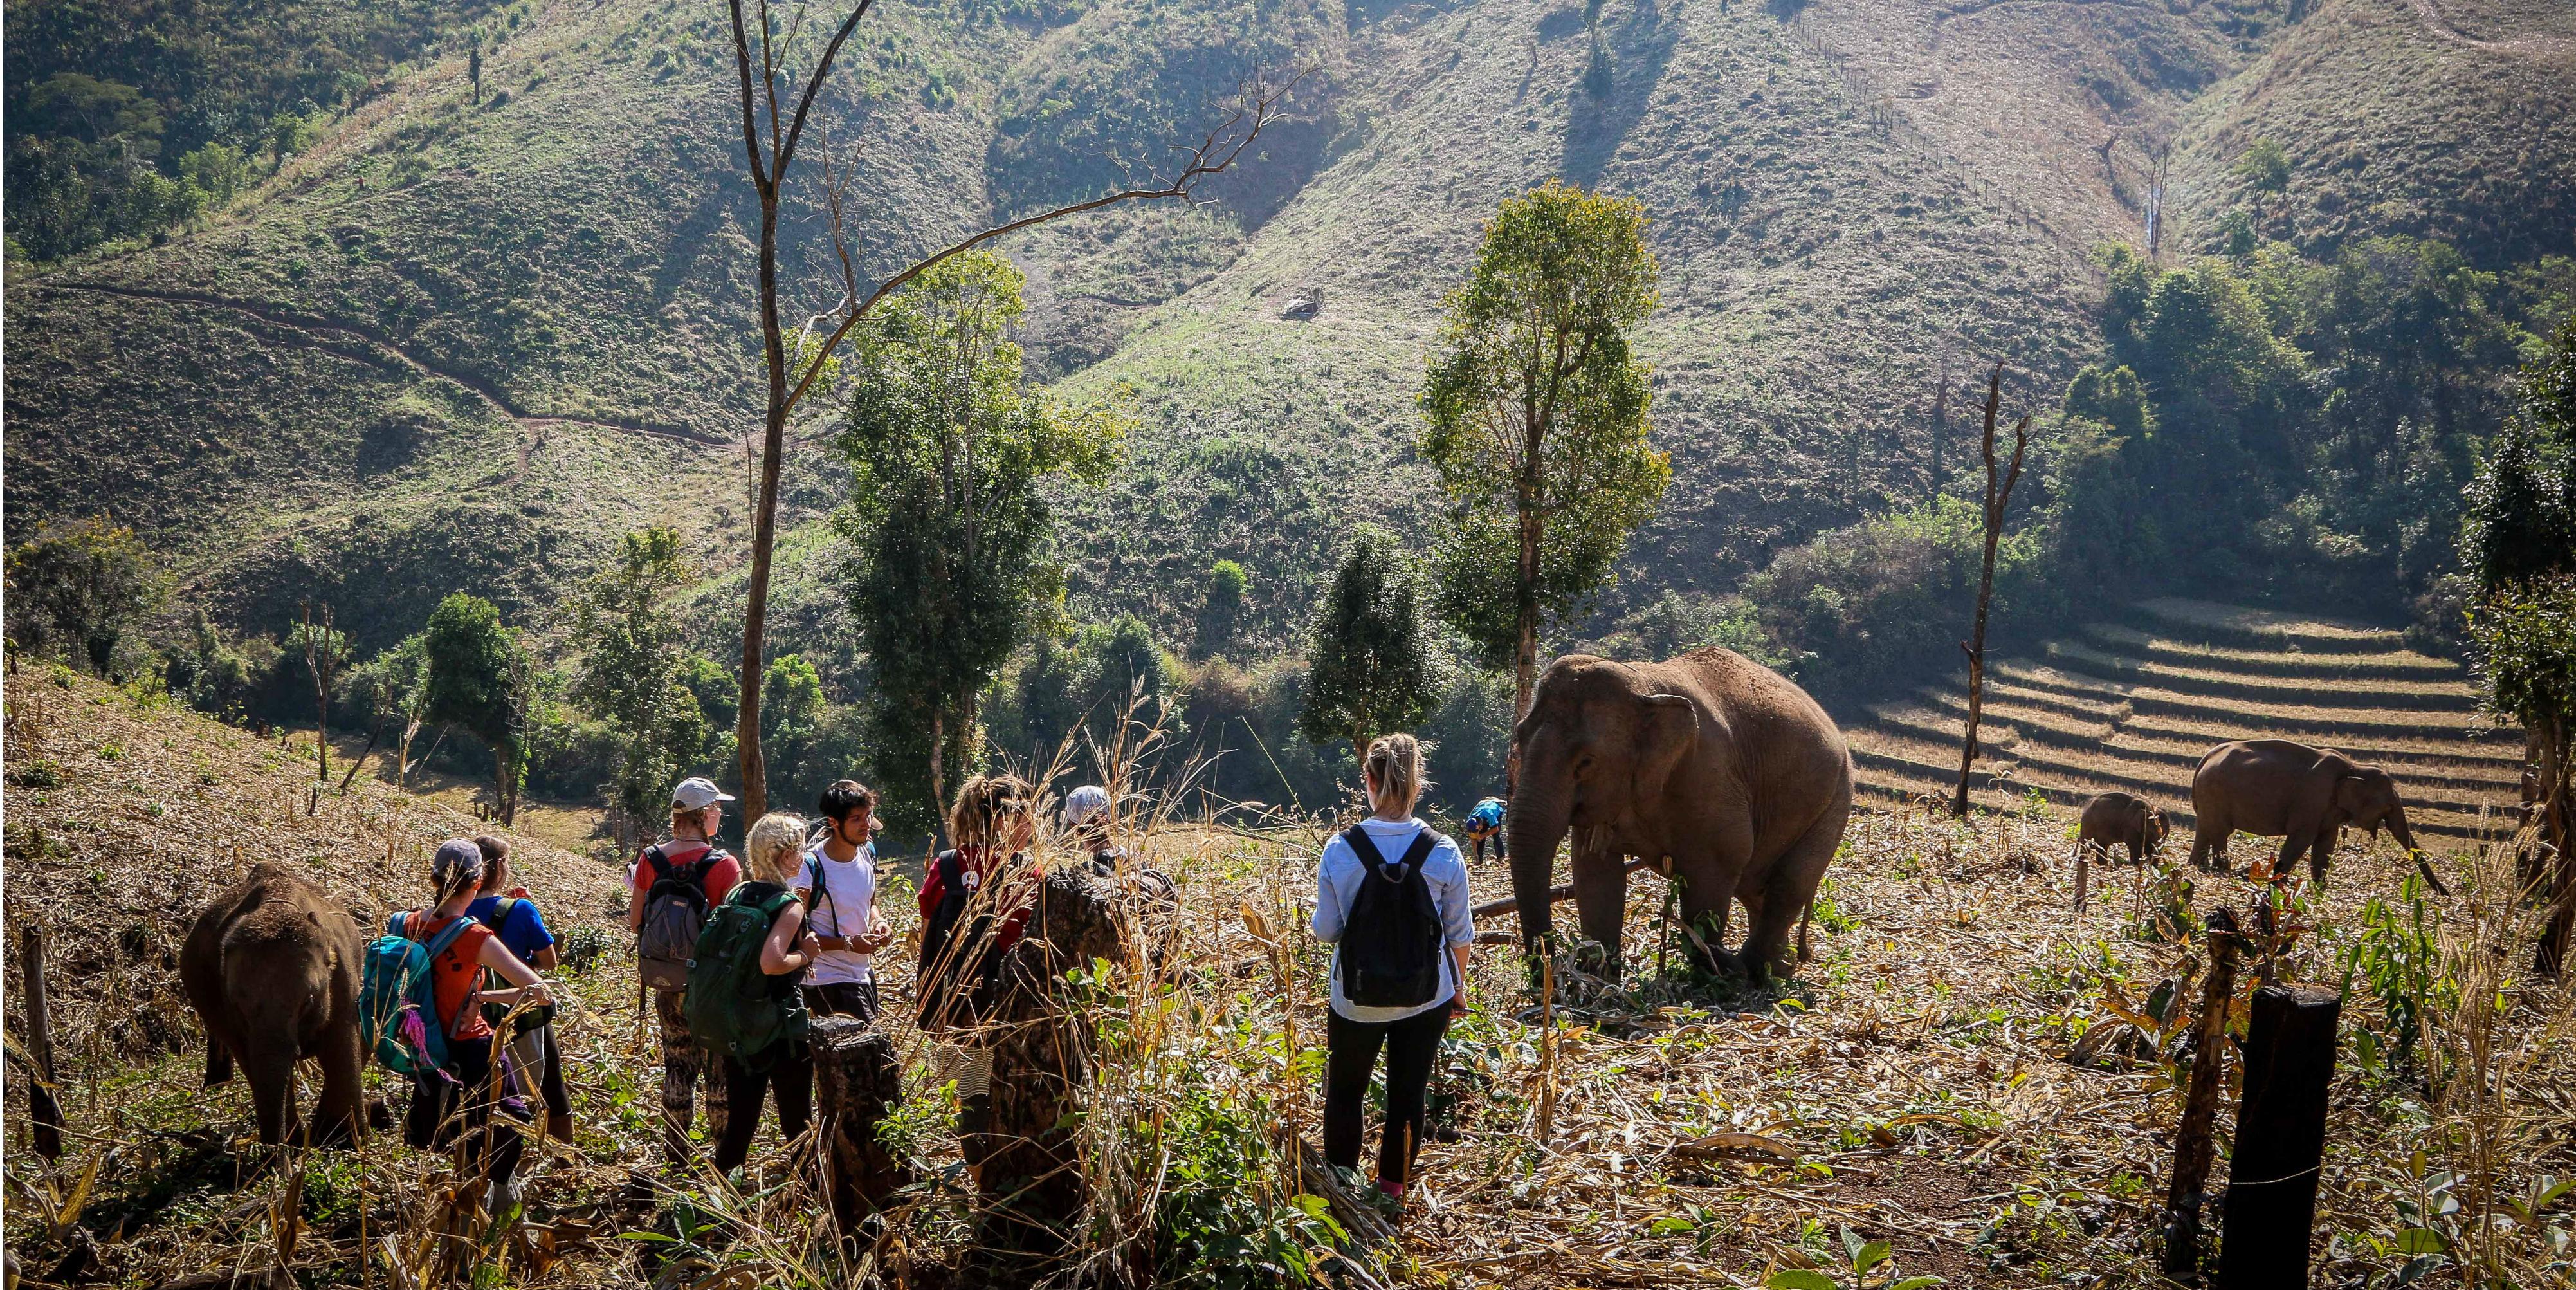 thailand's elephants